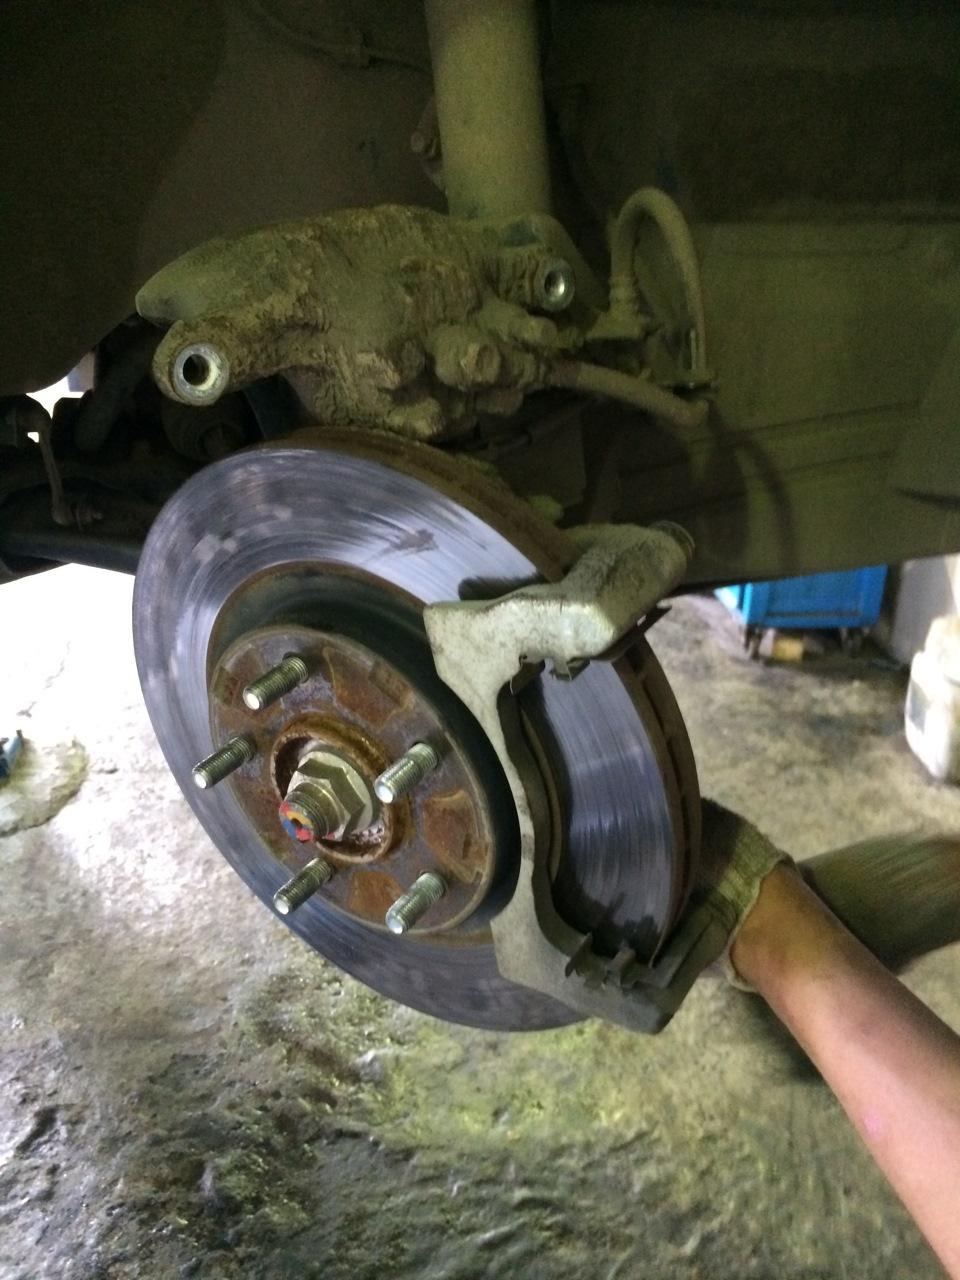 Замена тормозных колодок мицубиси аутлендер 3 своими руками 28